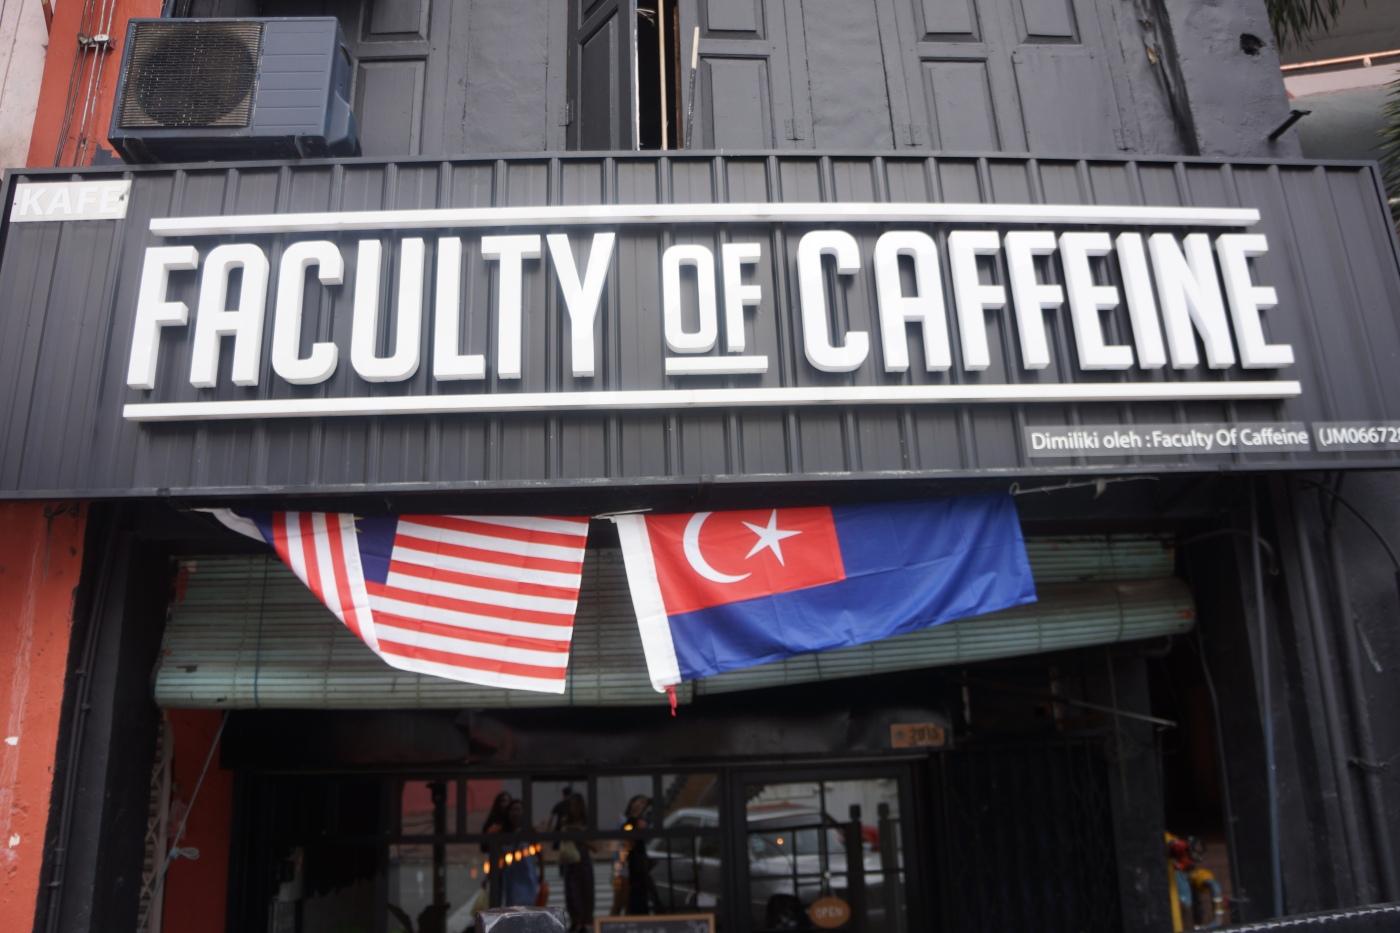 Johor Bahru Faculty of Caffeine